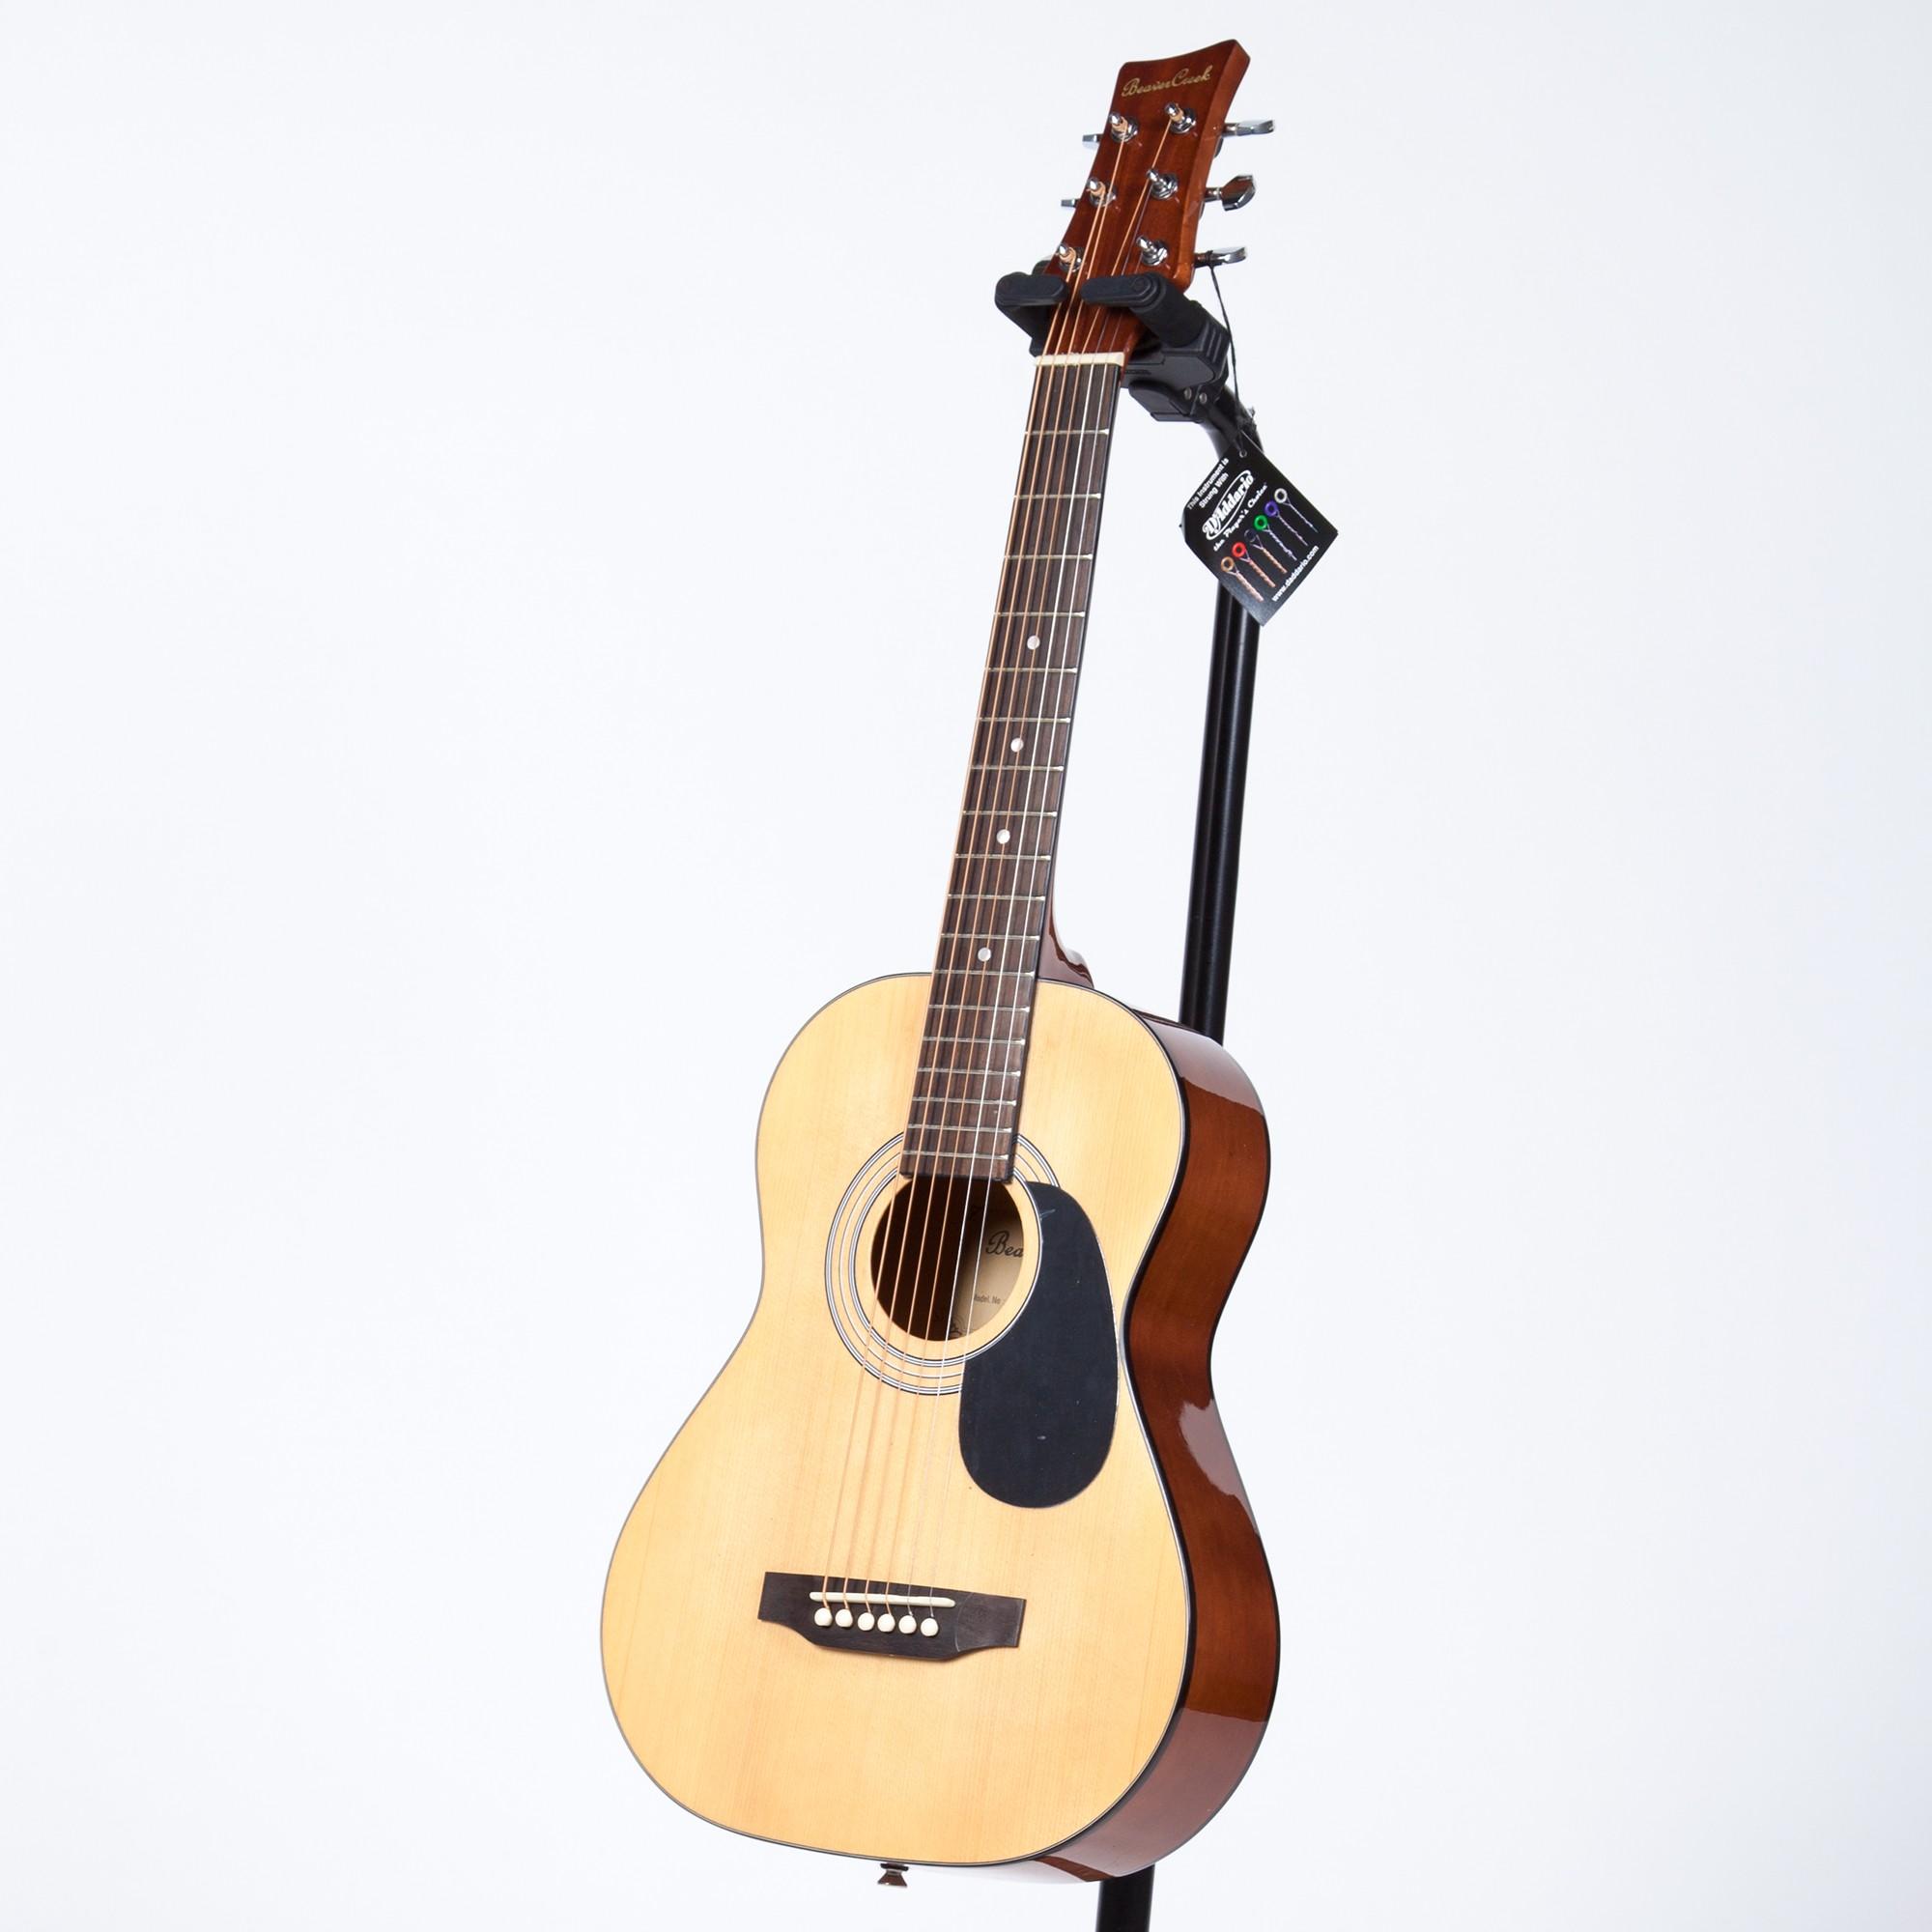 BeaverCreek BCTD401 1/2 Size Acoustic Guitar - Natural - Acoustic ...